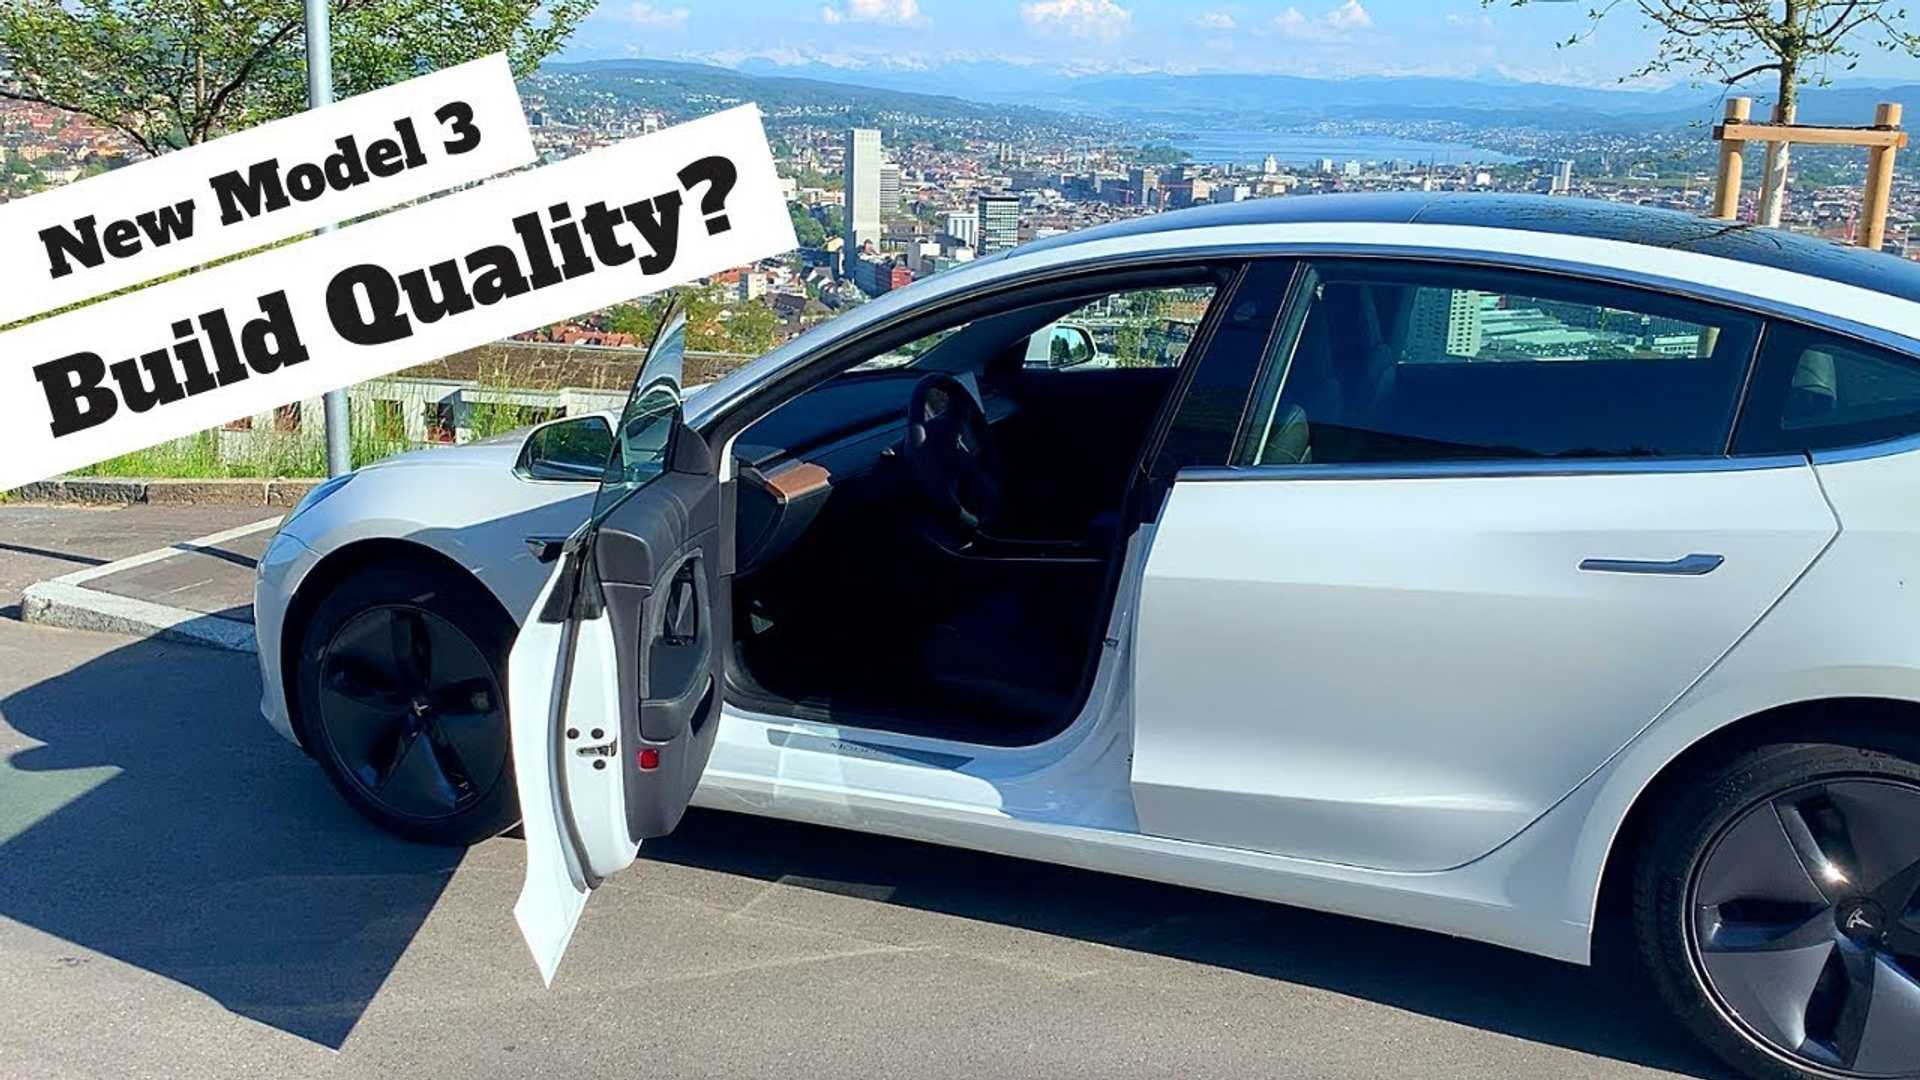 It Seems Tesla Model 3 Build Quality Has Improved Vastly: Video